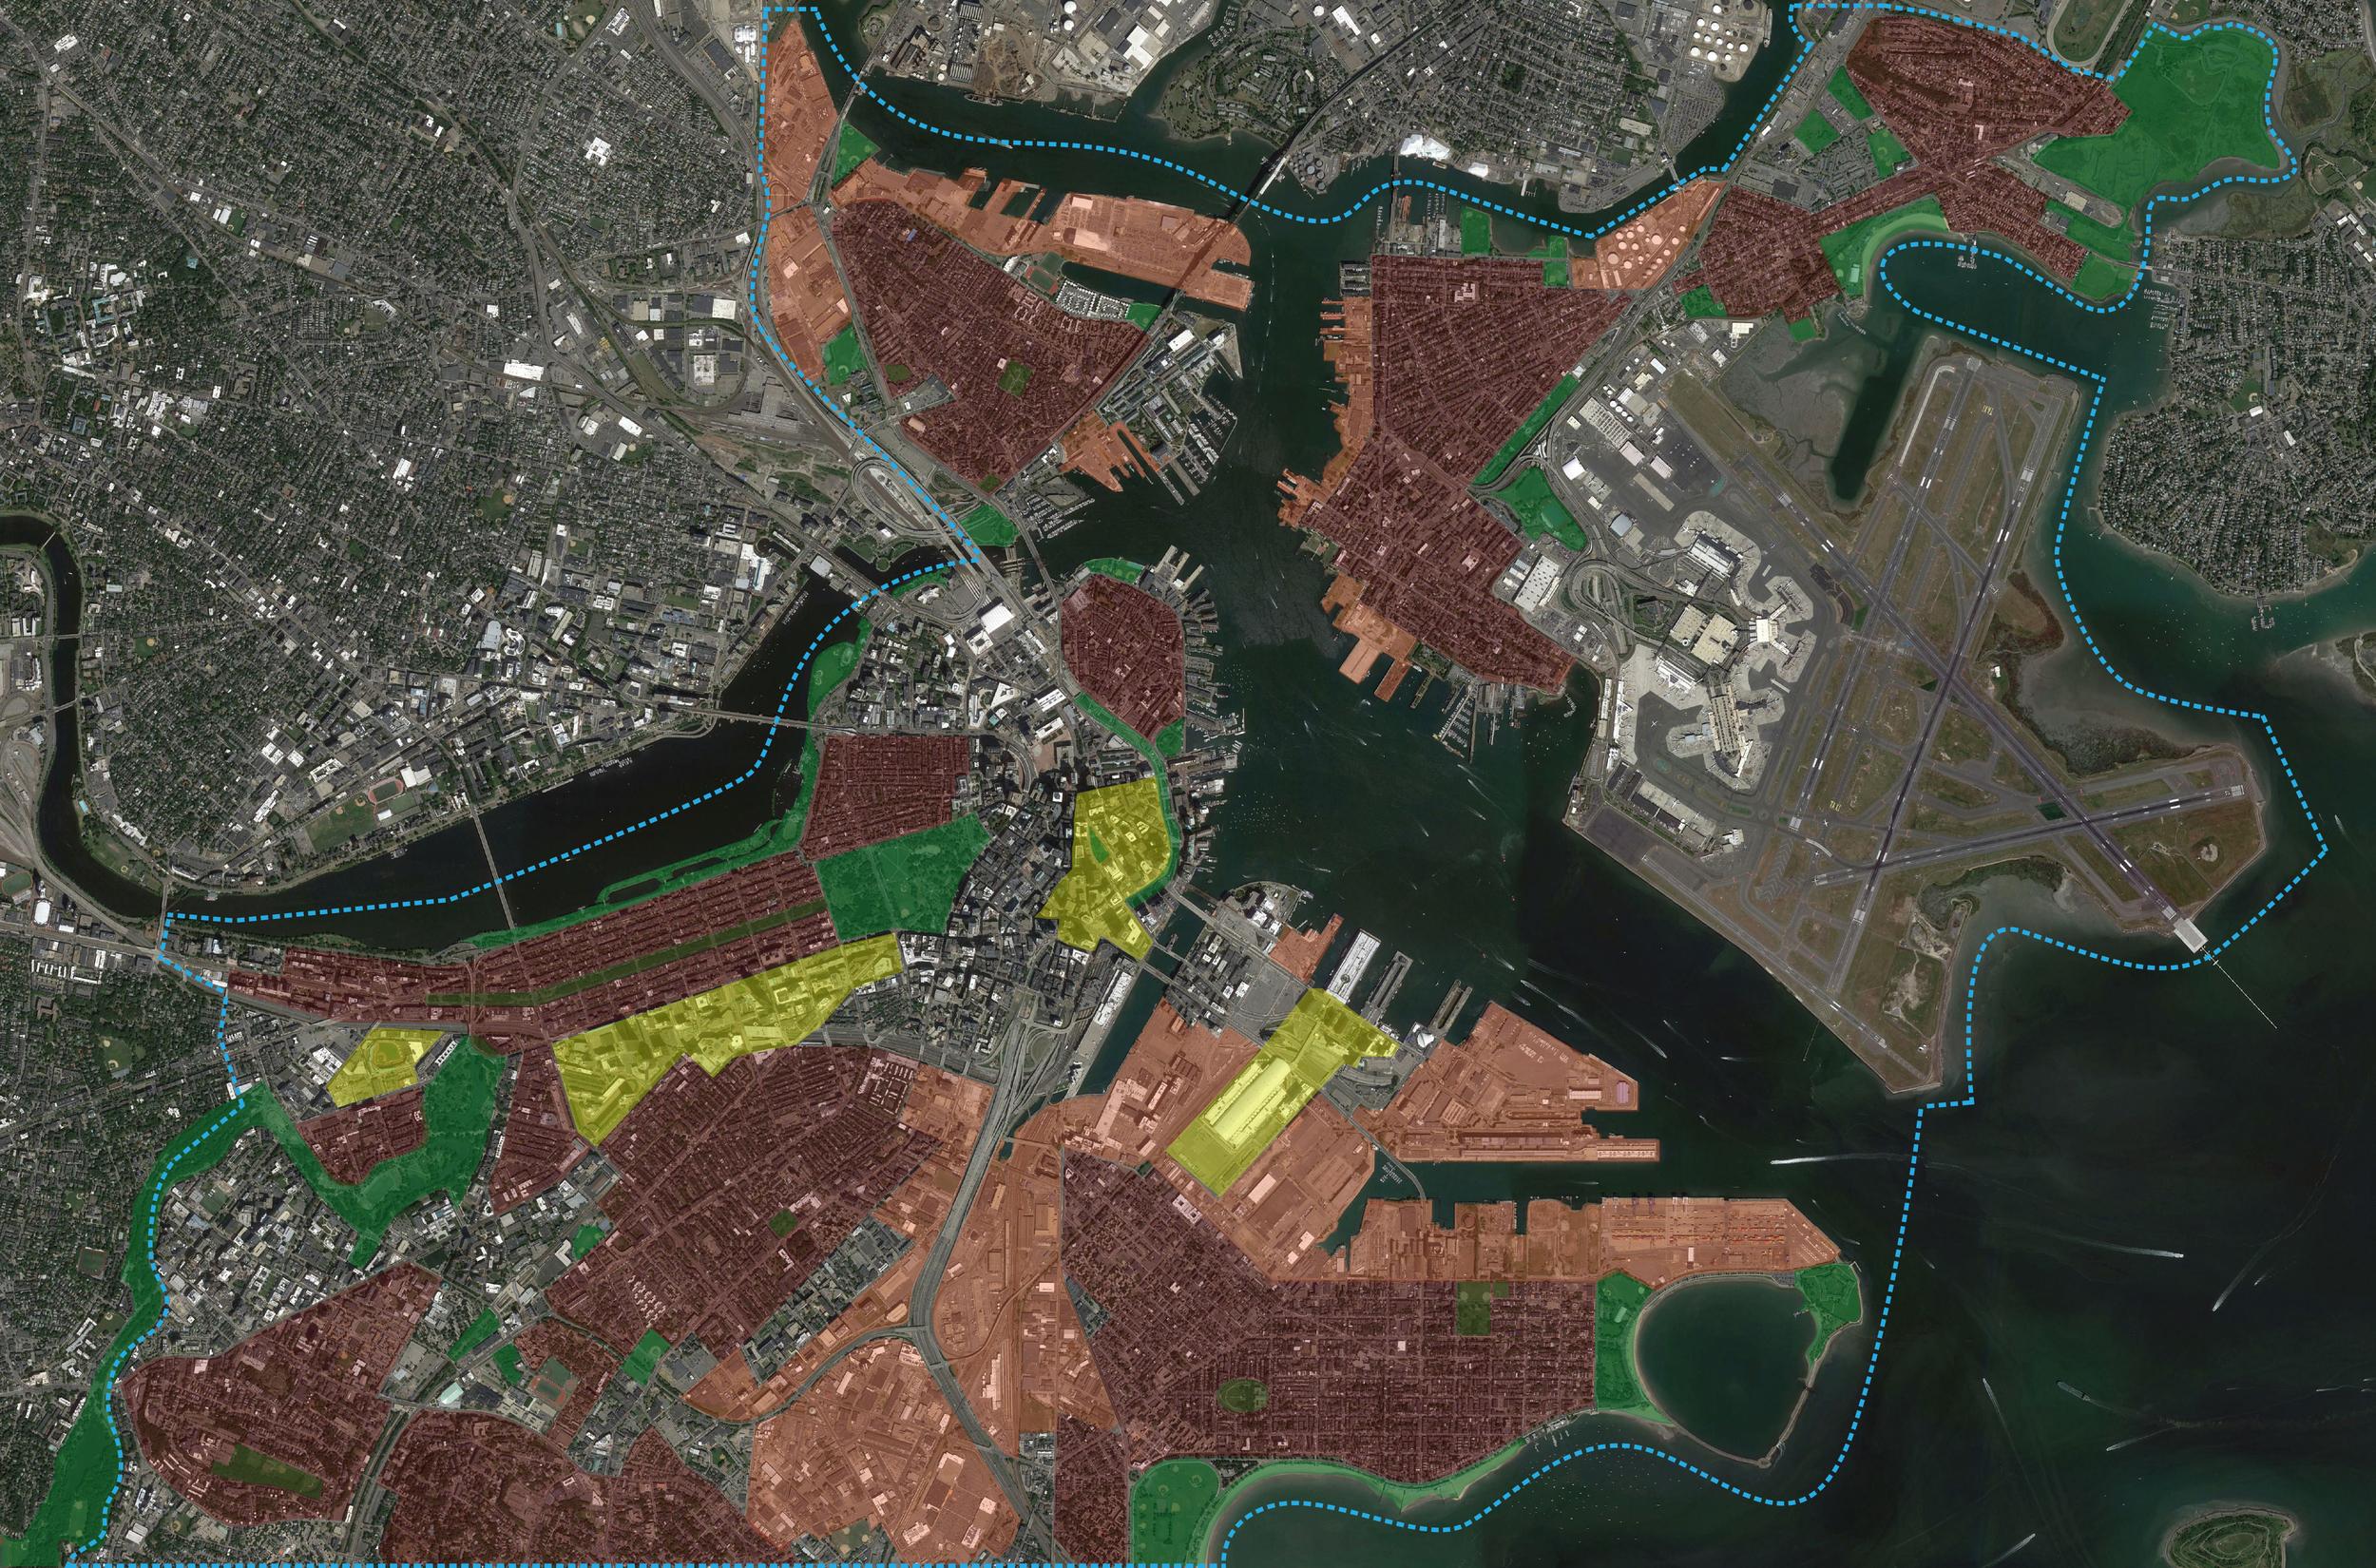 Composite hyper-worlds map of Boston